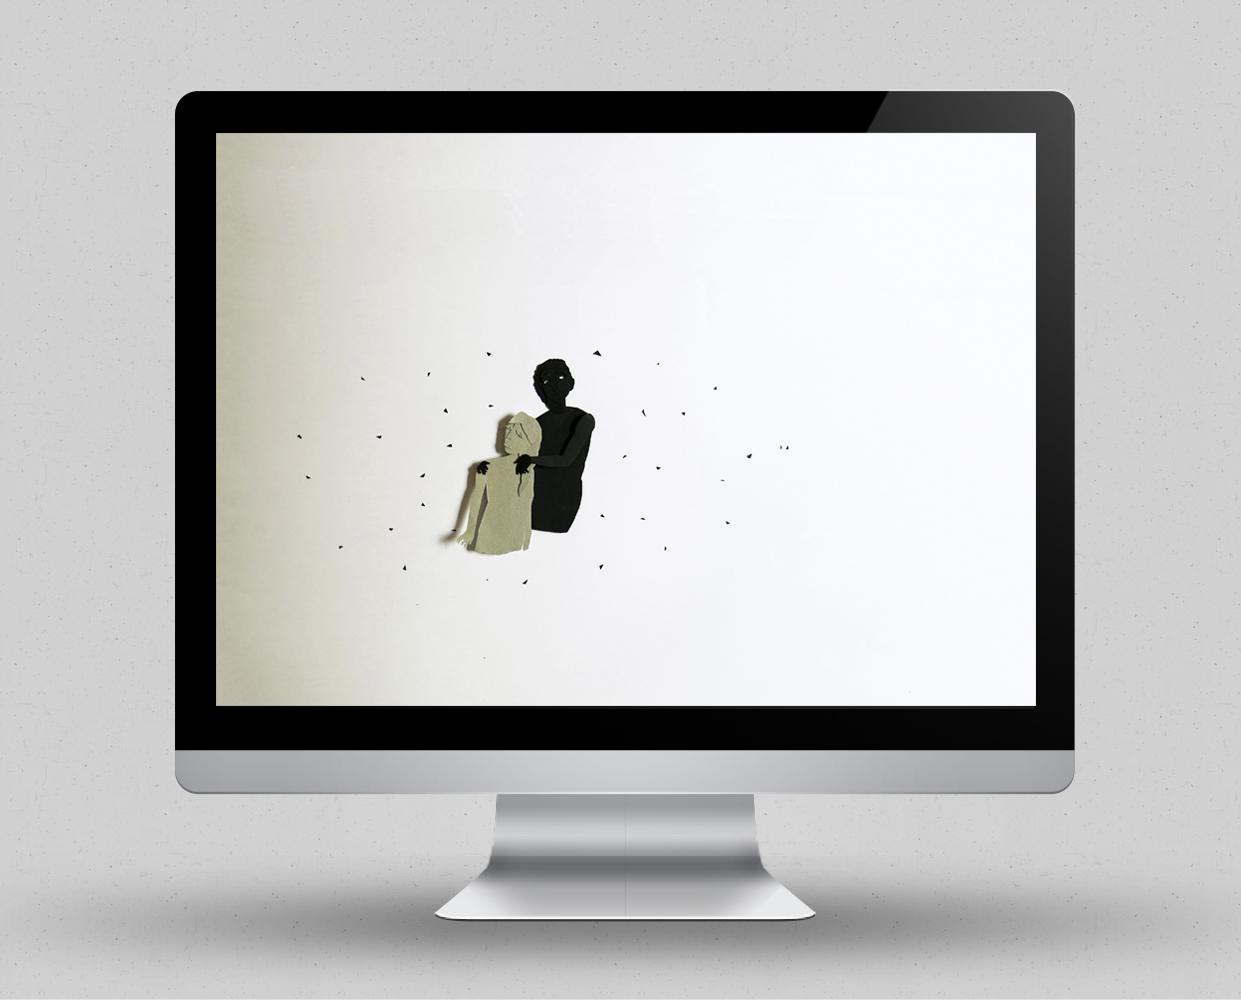 crossing_stages_ilustracion_01.jpg